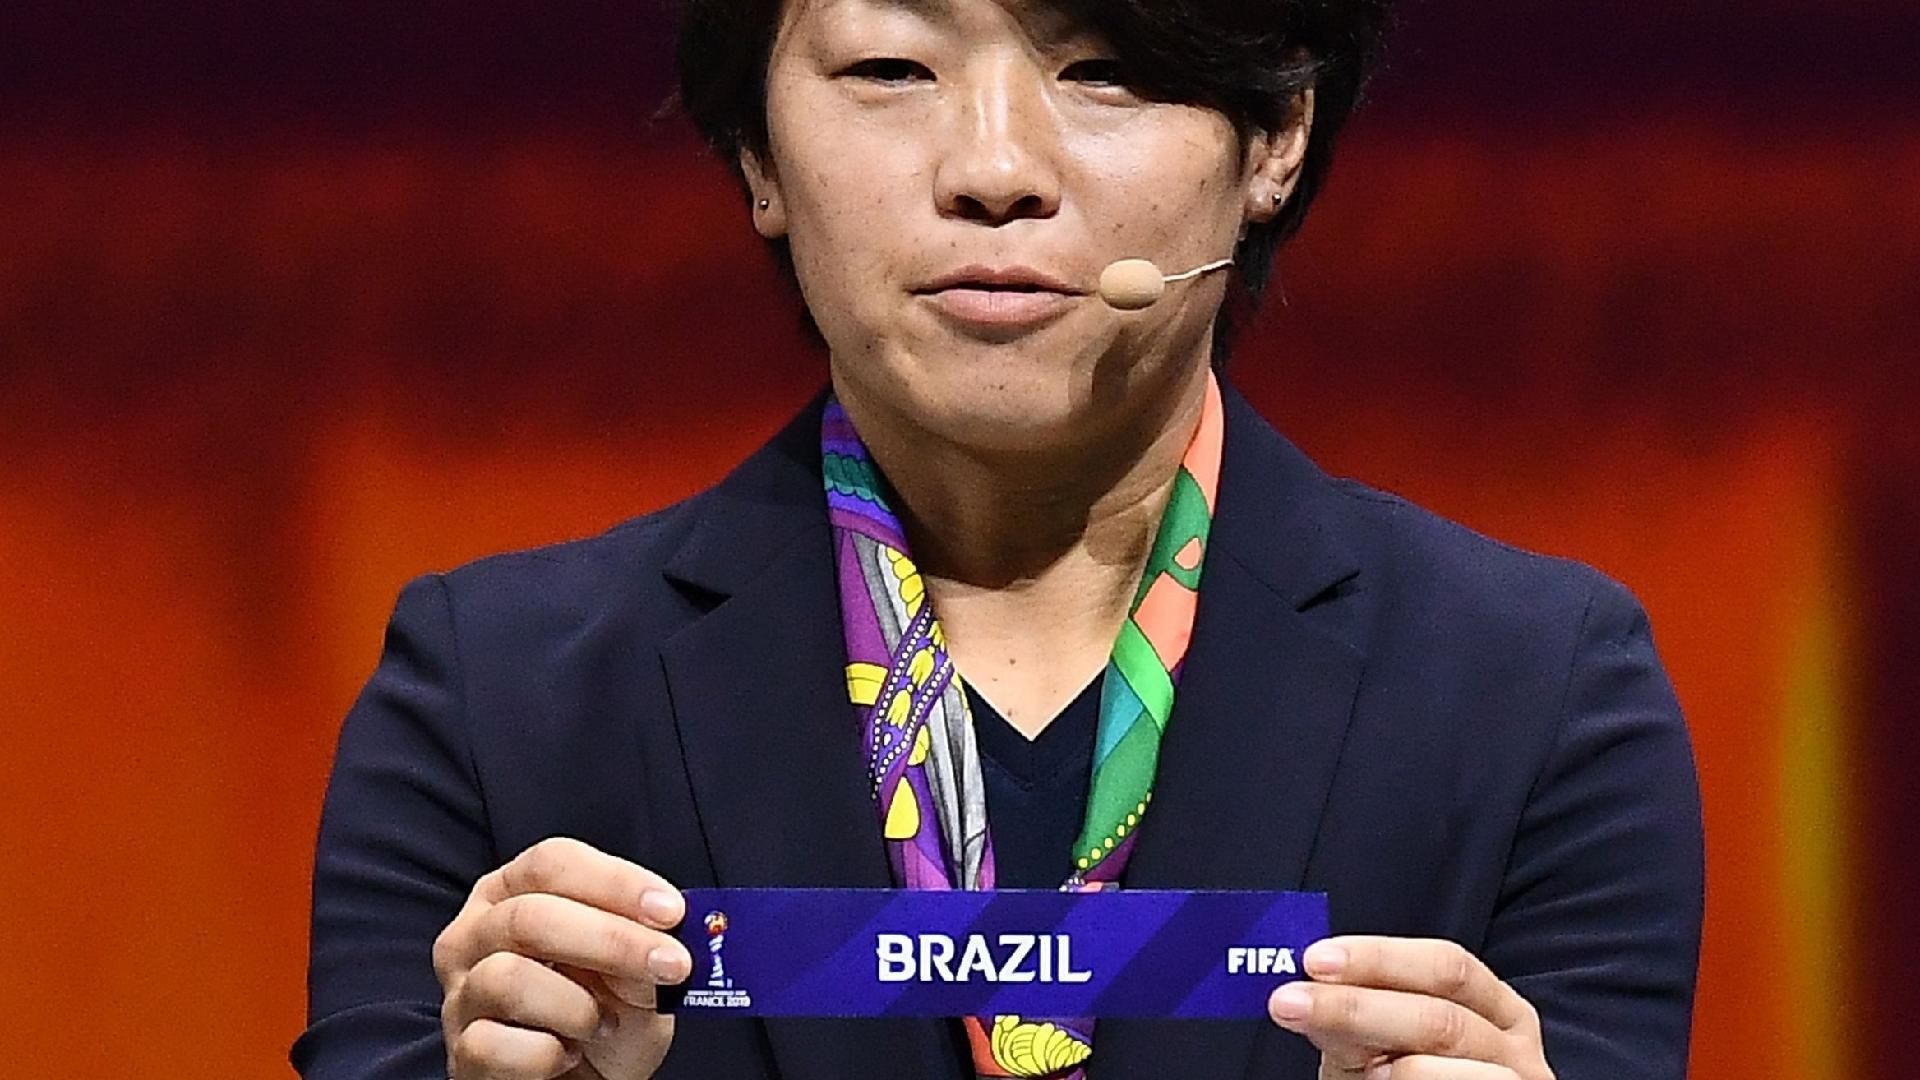 Brasil Copa do Mundo Feminina sorteio dos grupos